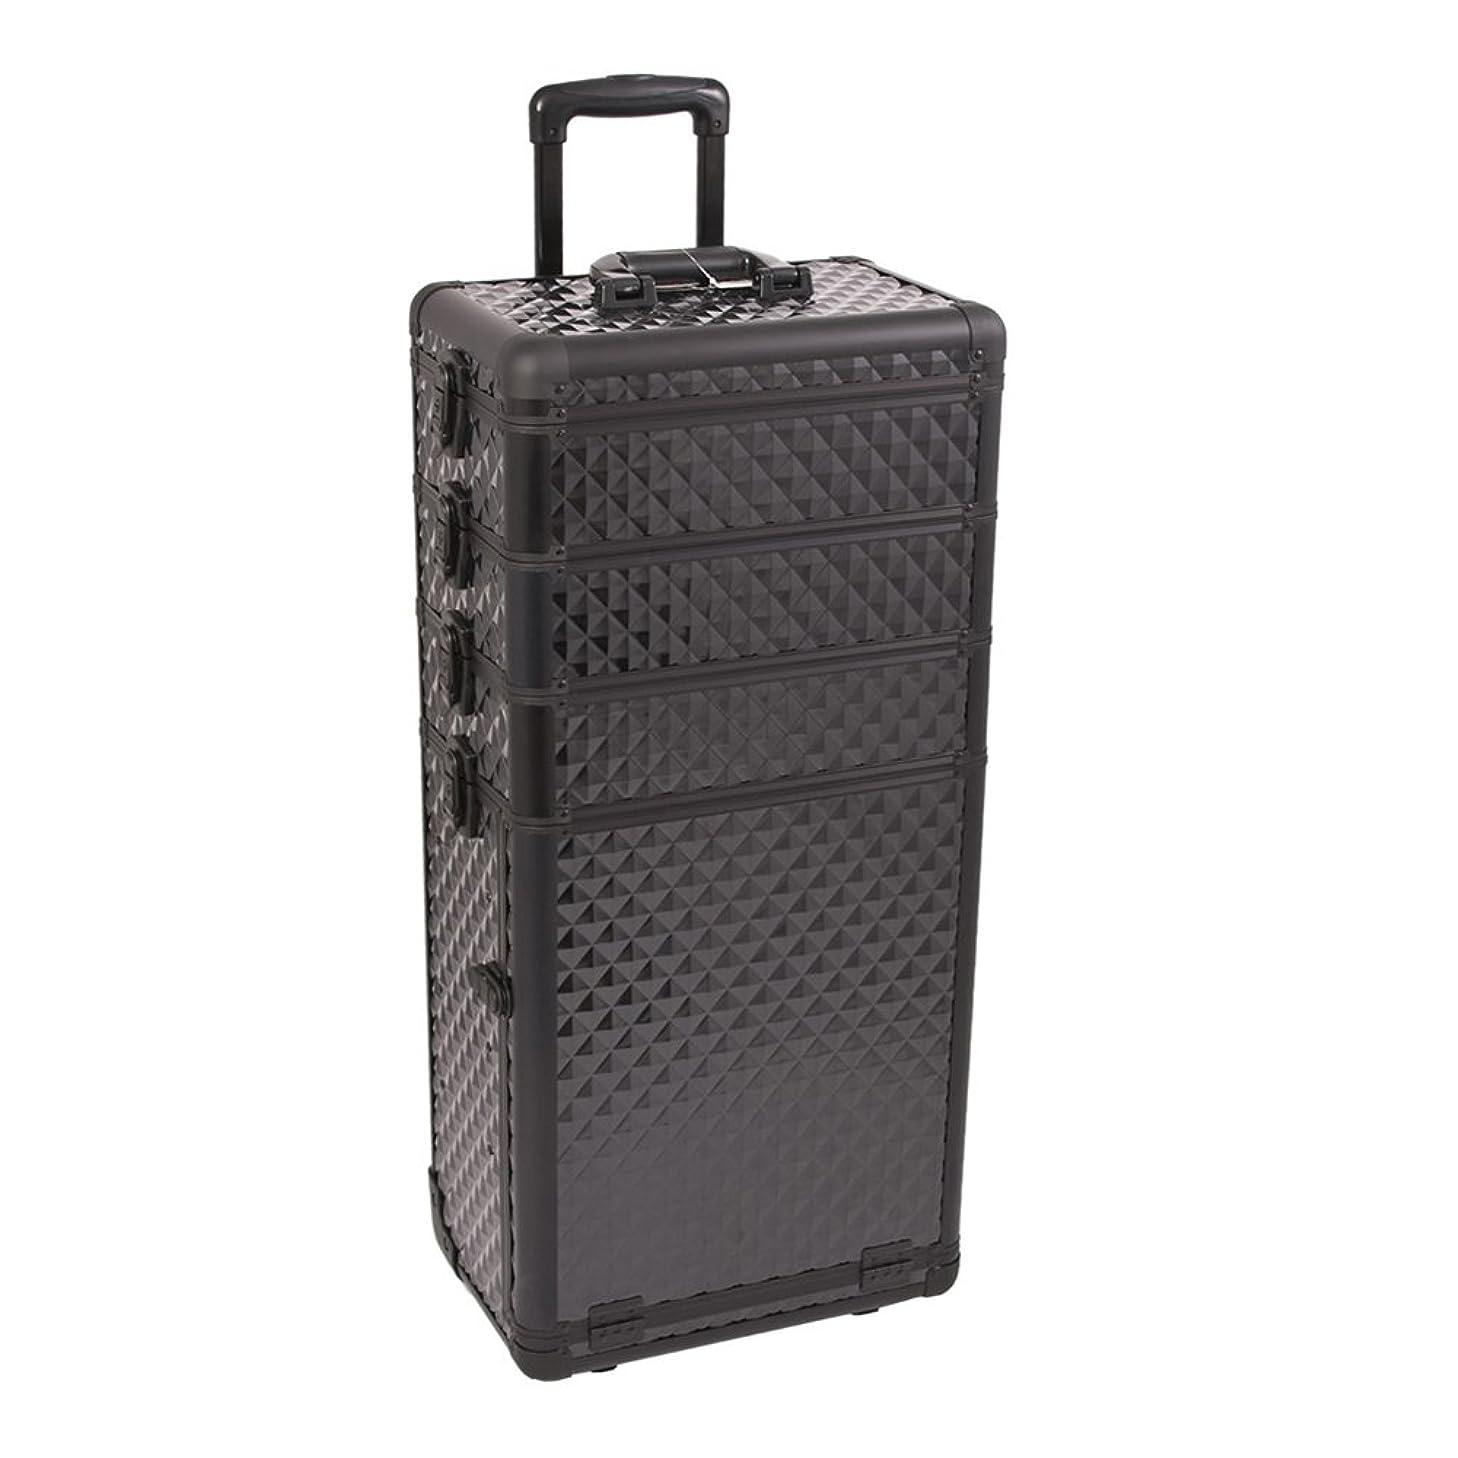 Craft Accents I3363 Diamond Trolley Craft/Quilting Storage Case, Black